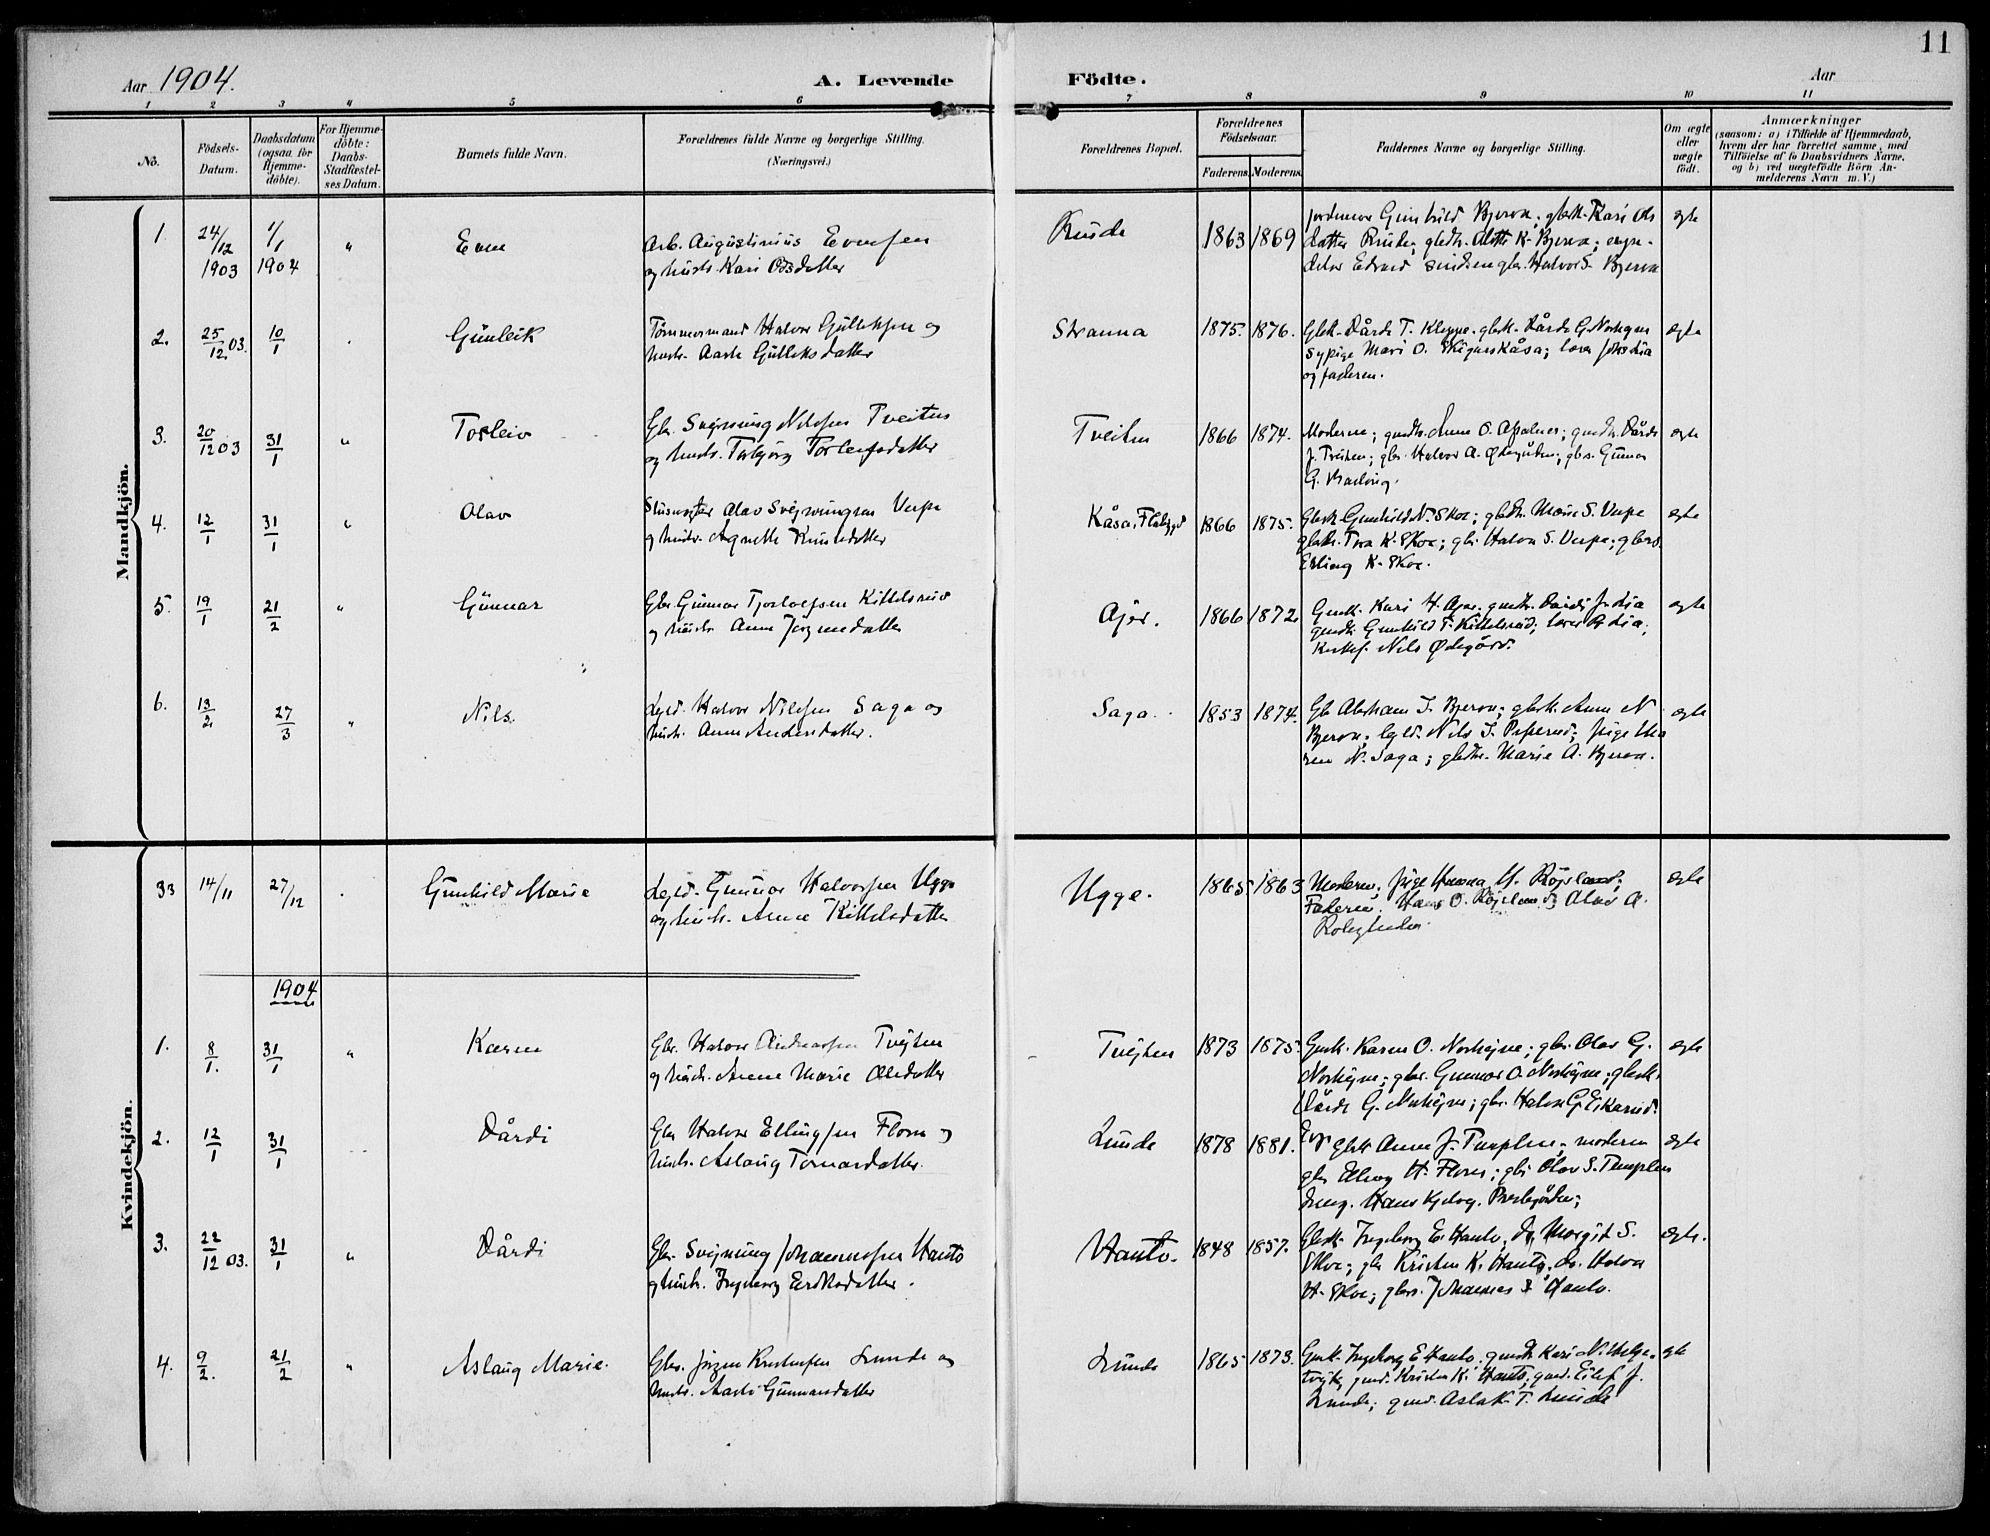 SAKO, Lunde kirkebøker, F/Fa/L0004: Ministerialbok nr. I 4, 1902-1913, s. 11